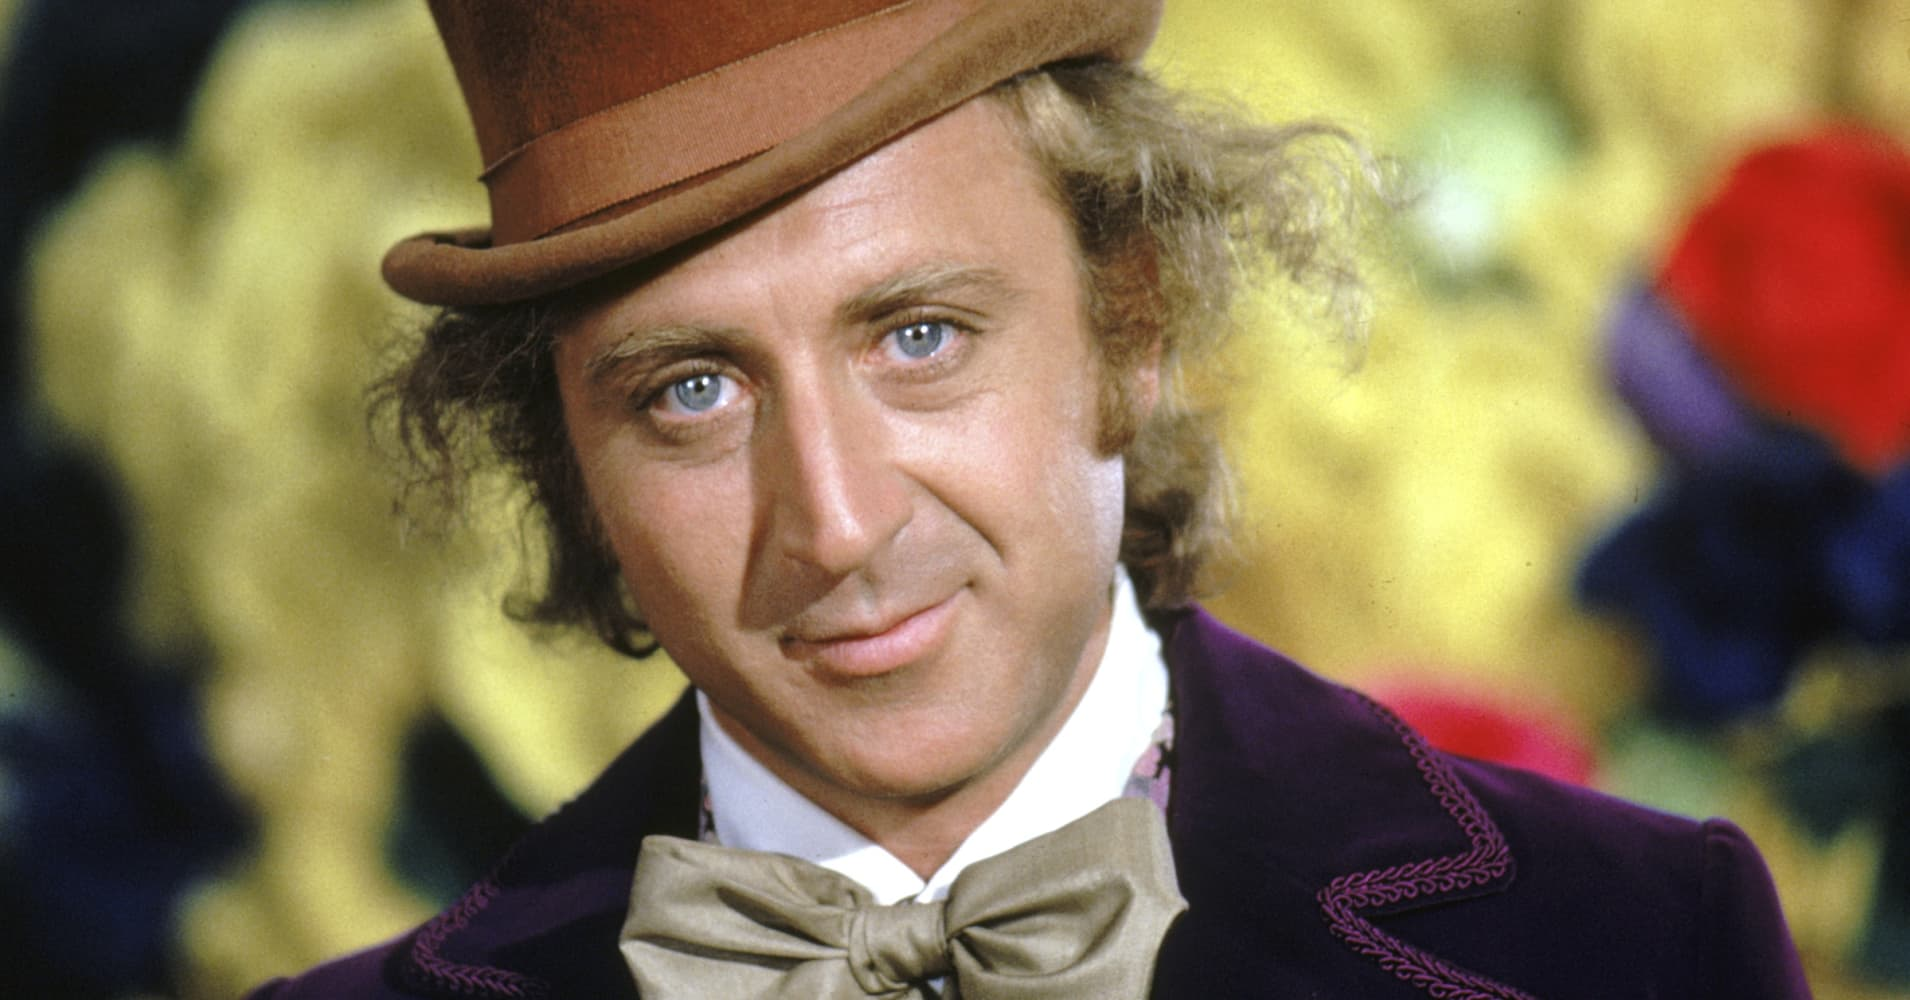 Gene Wilder as Willy Wonka in 'Willy Wonka & The Chocolate Factory'